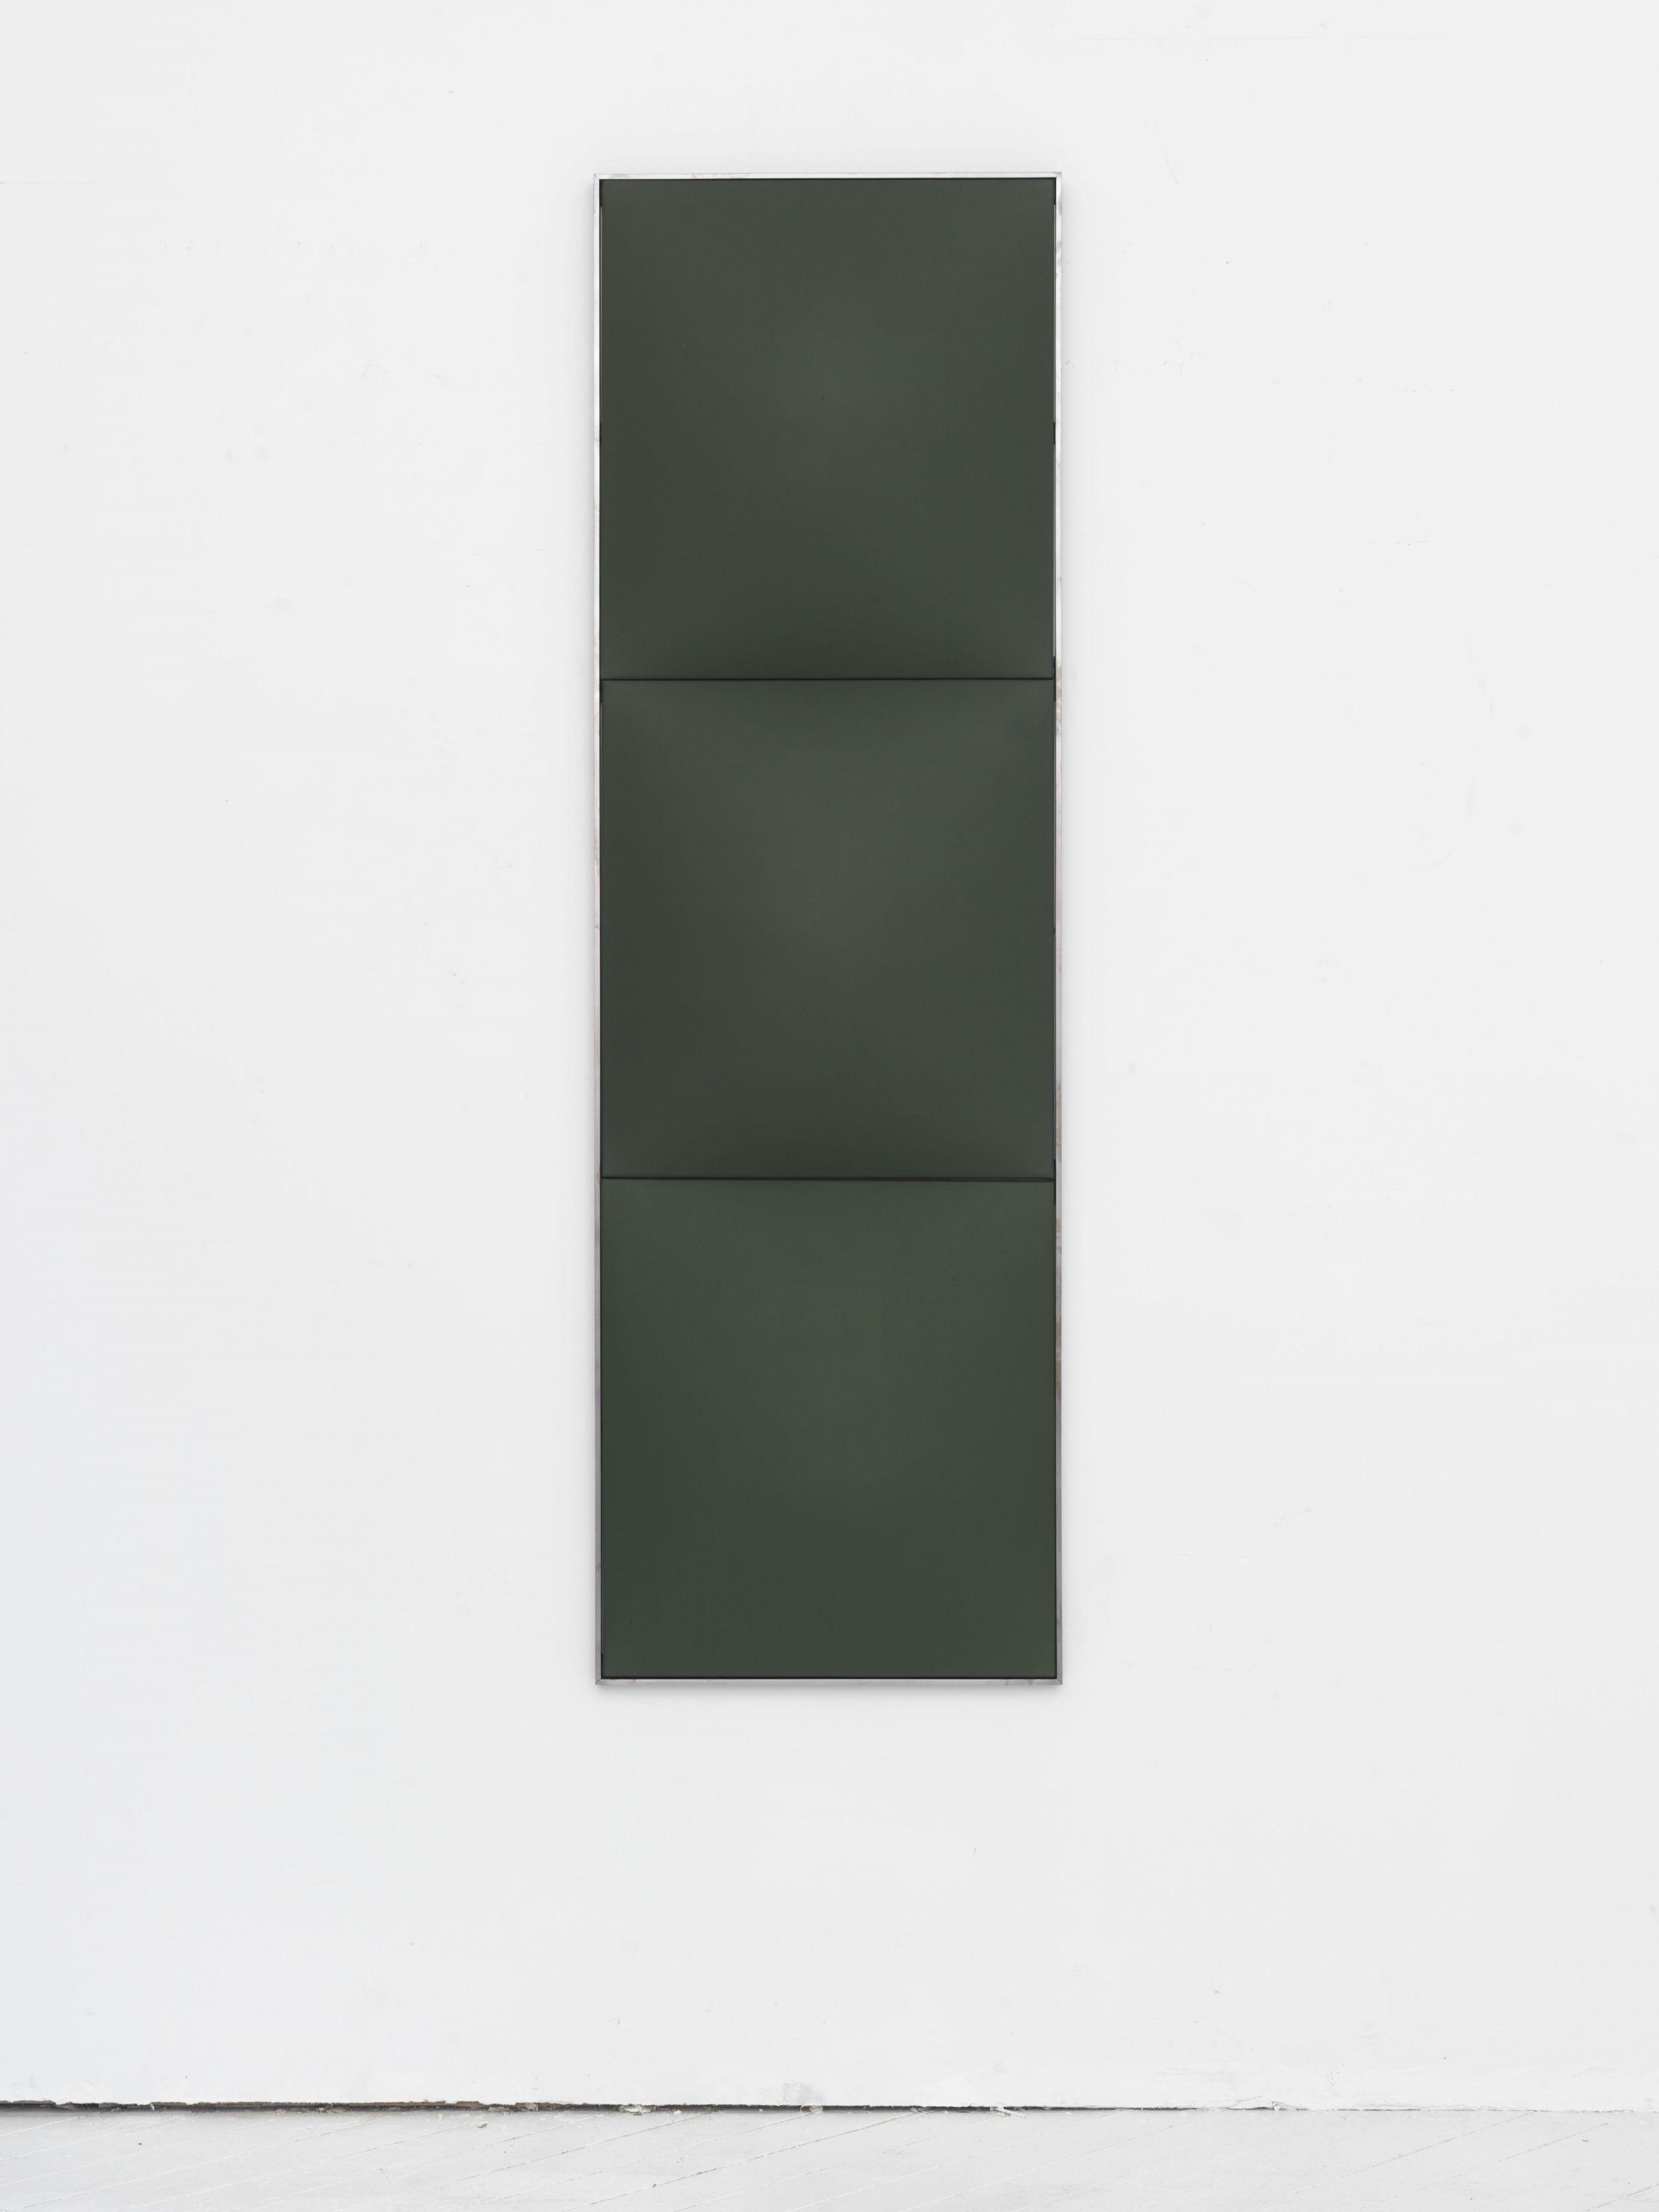 Green in Blue, 2016, Fiberglass reinforced plaster and oil on cotton in artist frame